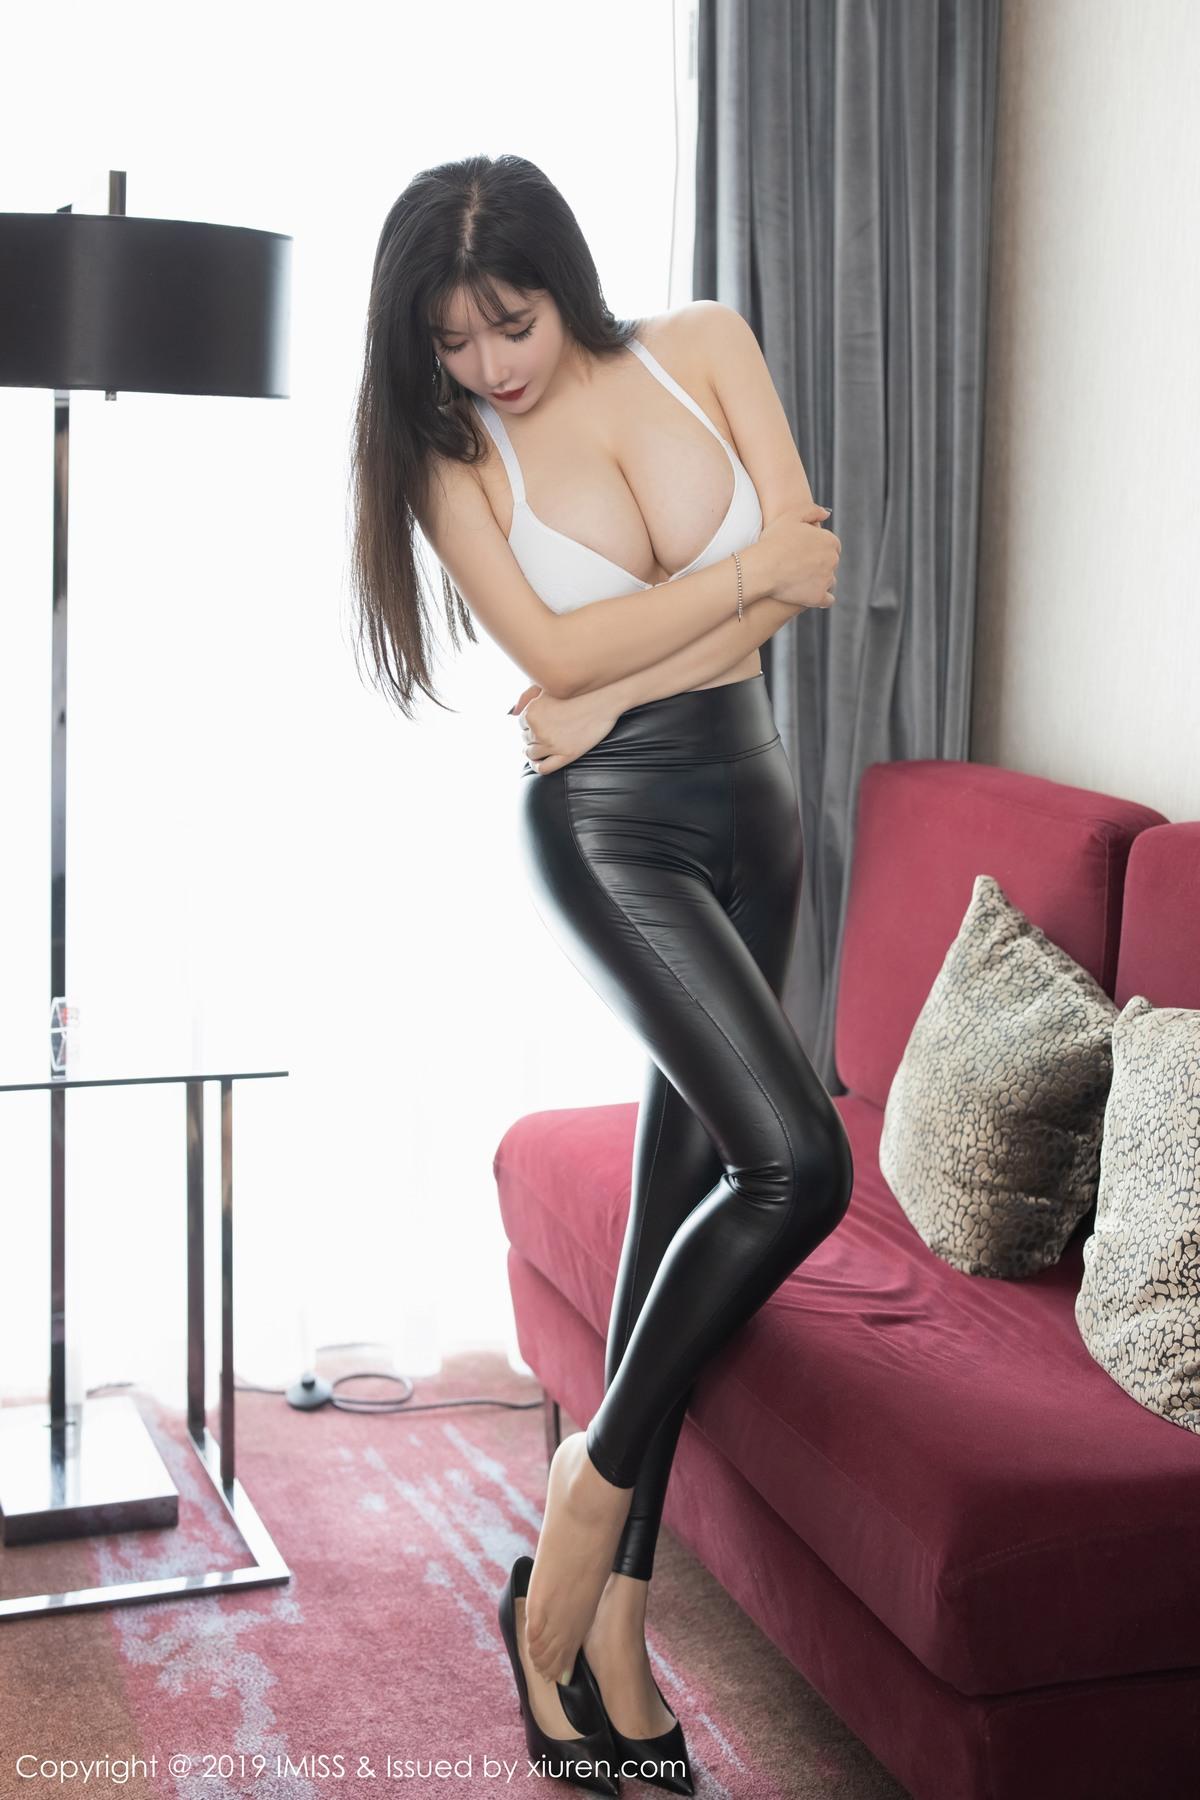 [IMiss爱蜜社]2019.11.25 Vol.404 性感皮裤展现完美身材 心妍小公主